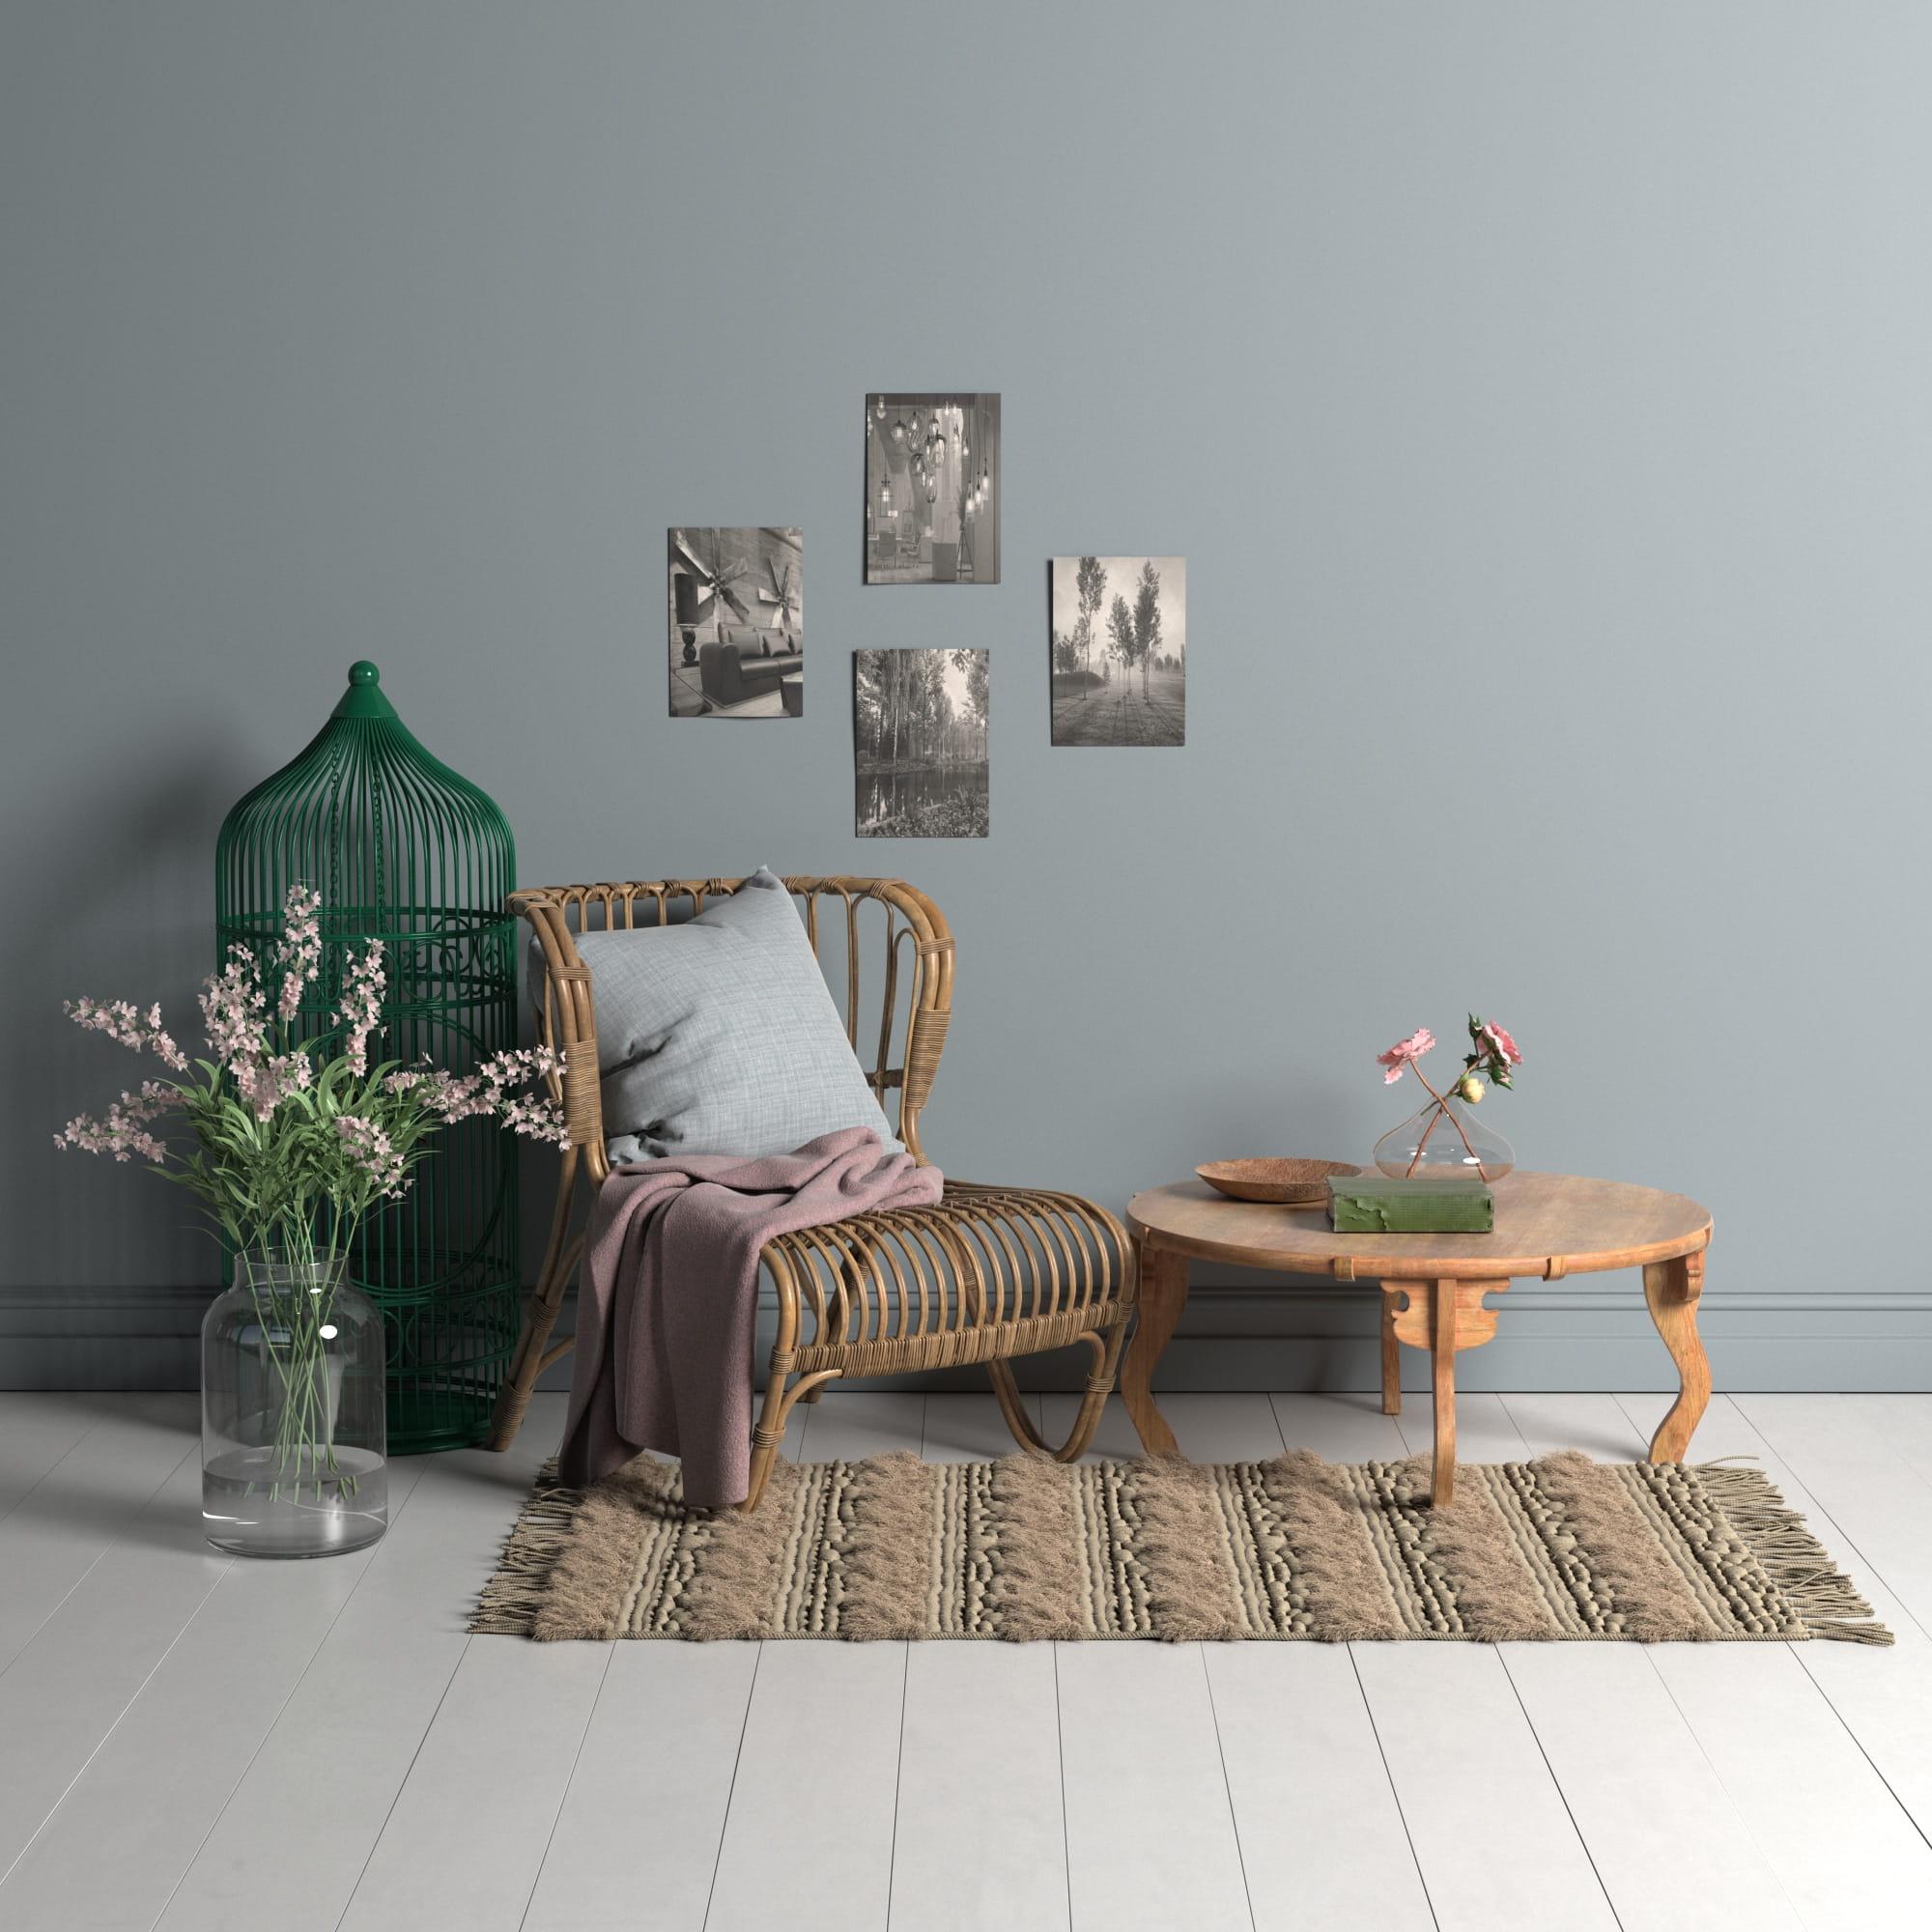 furniture set 15 AM225